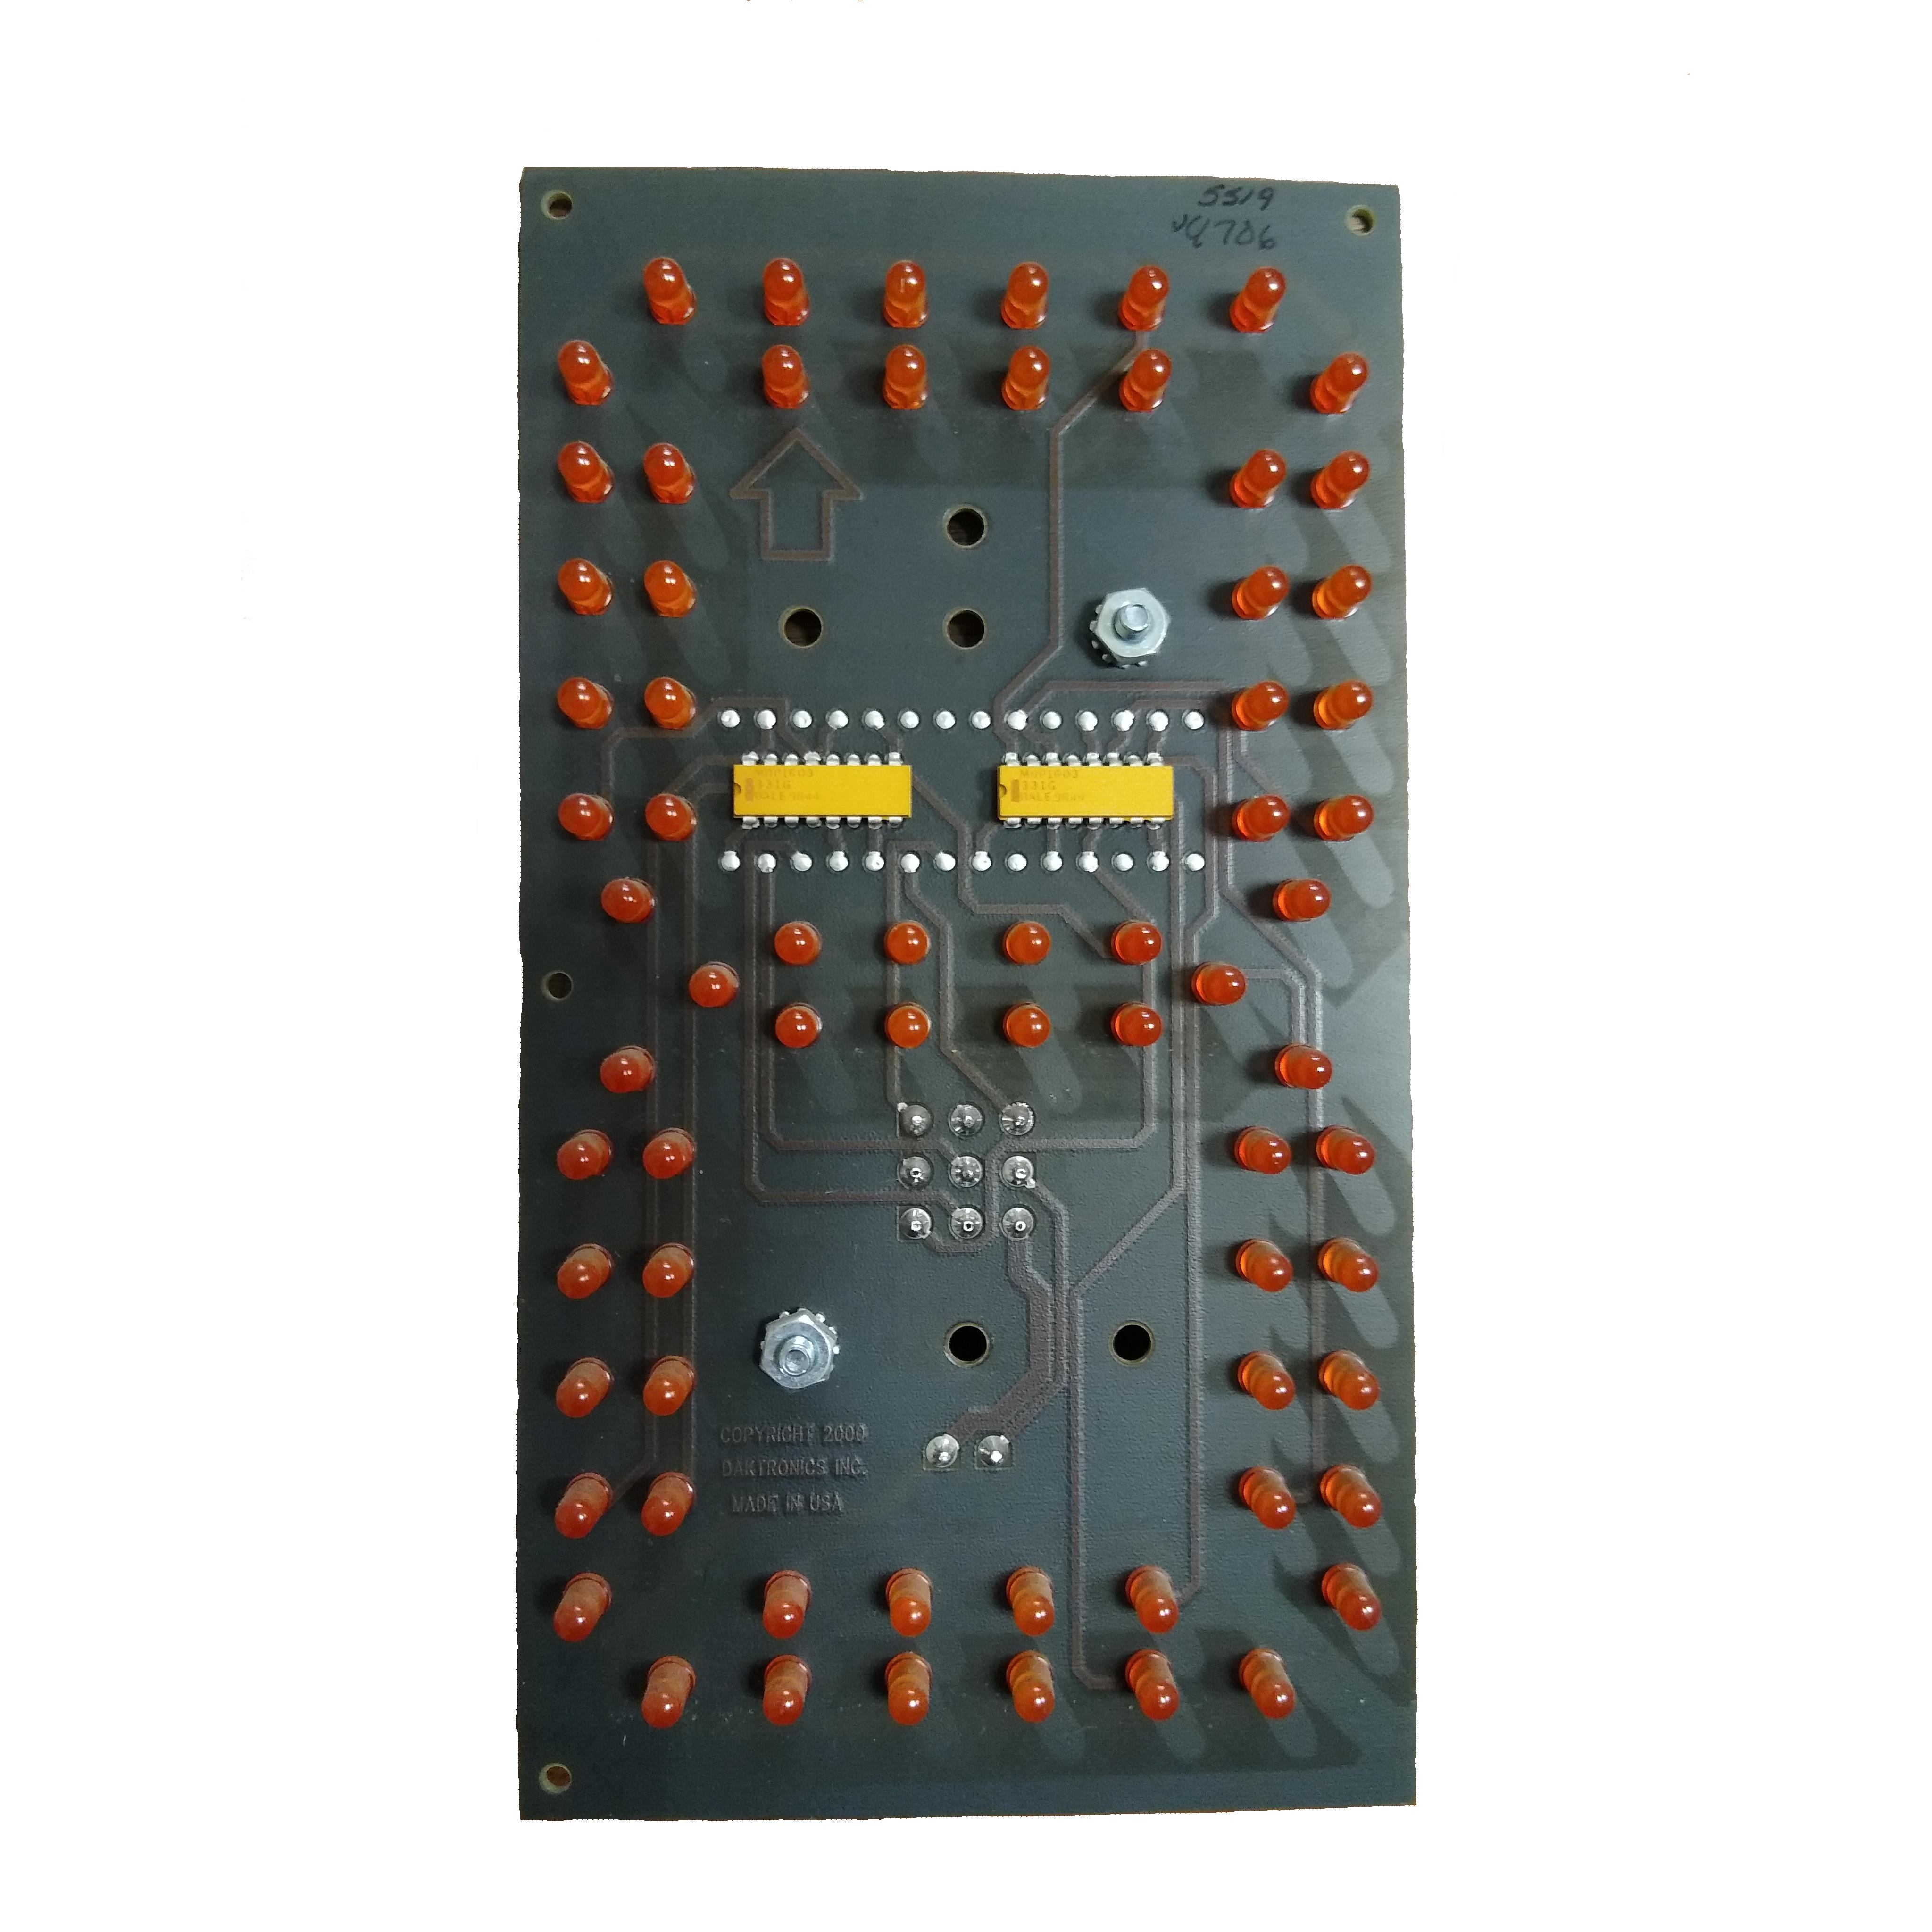 (0P-1150-0082) Daktronics 7